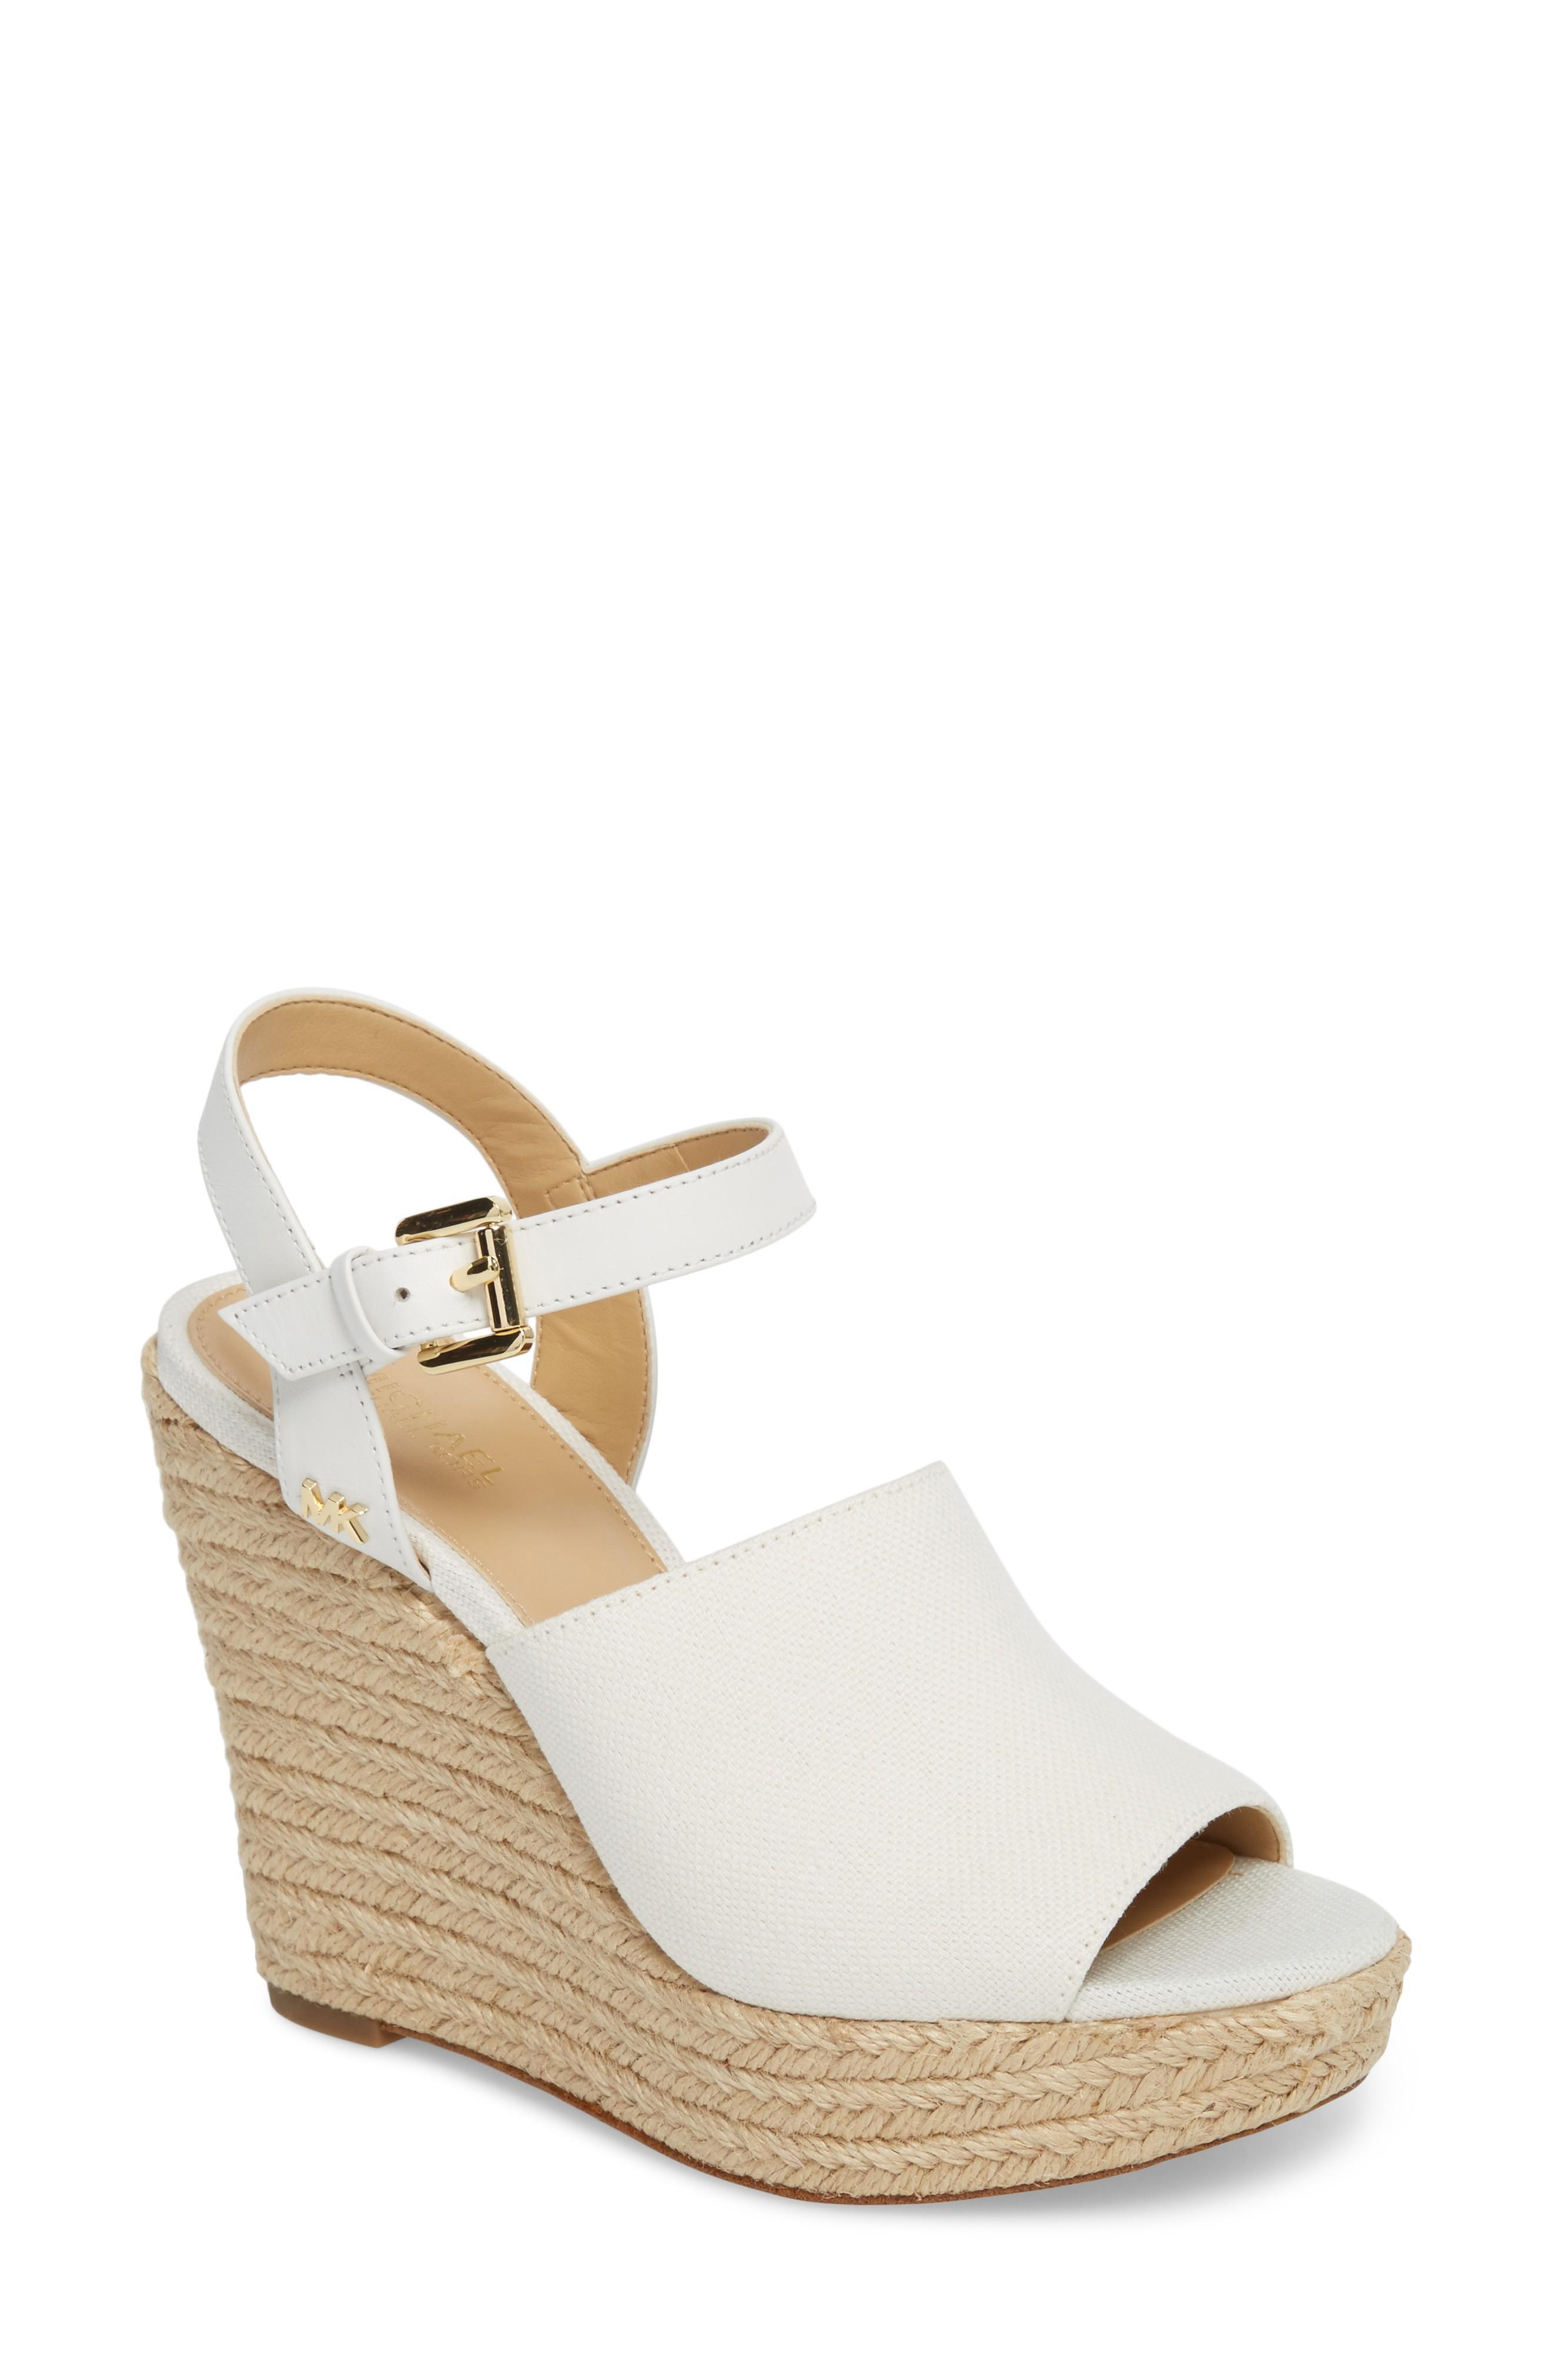 c2740f1698a4 Michael Michael Kors Penelope Espadrille Wedge Sandal In Optic White Canvas